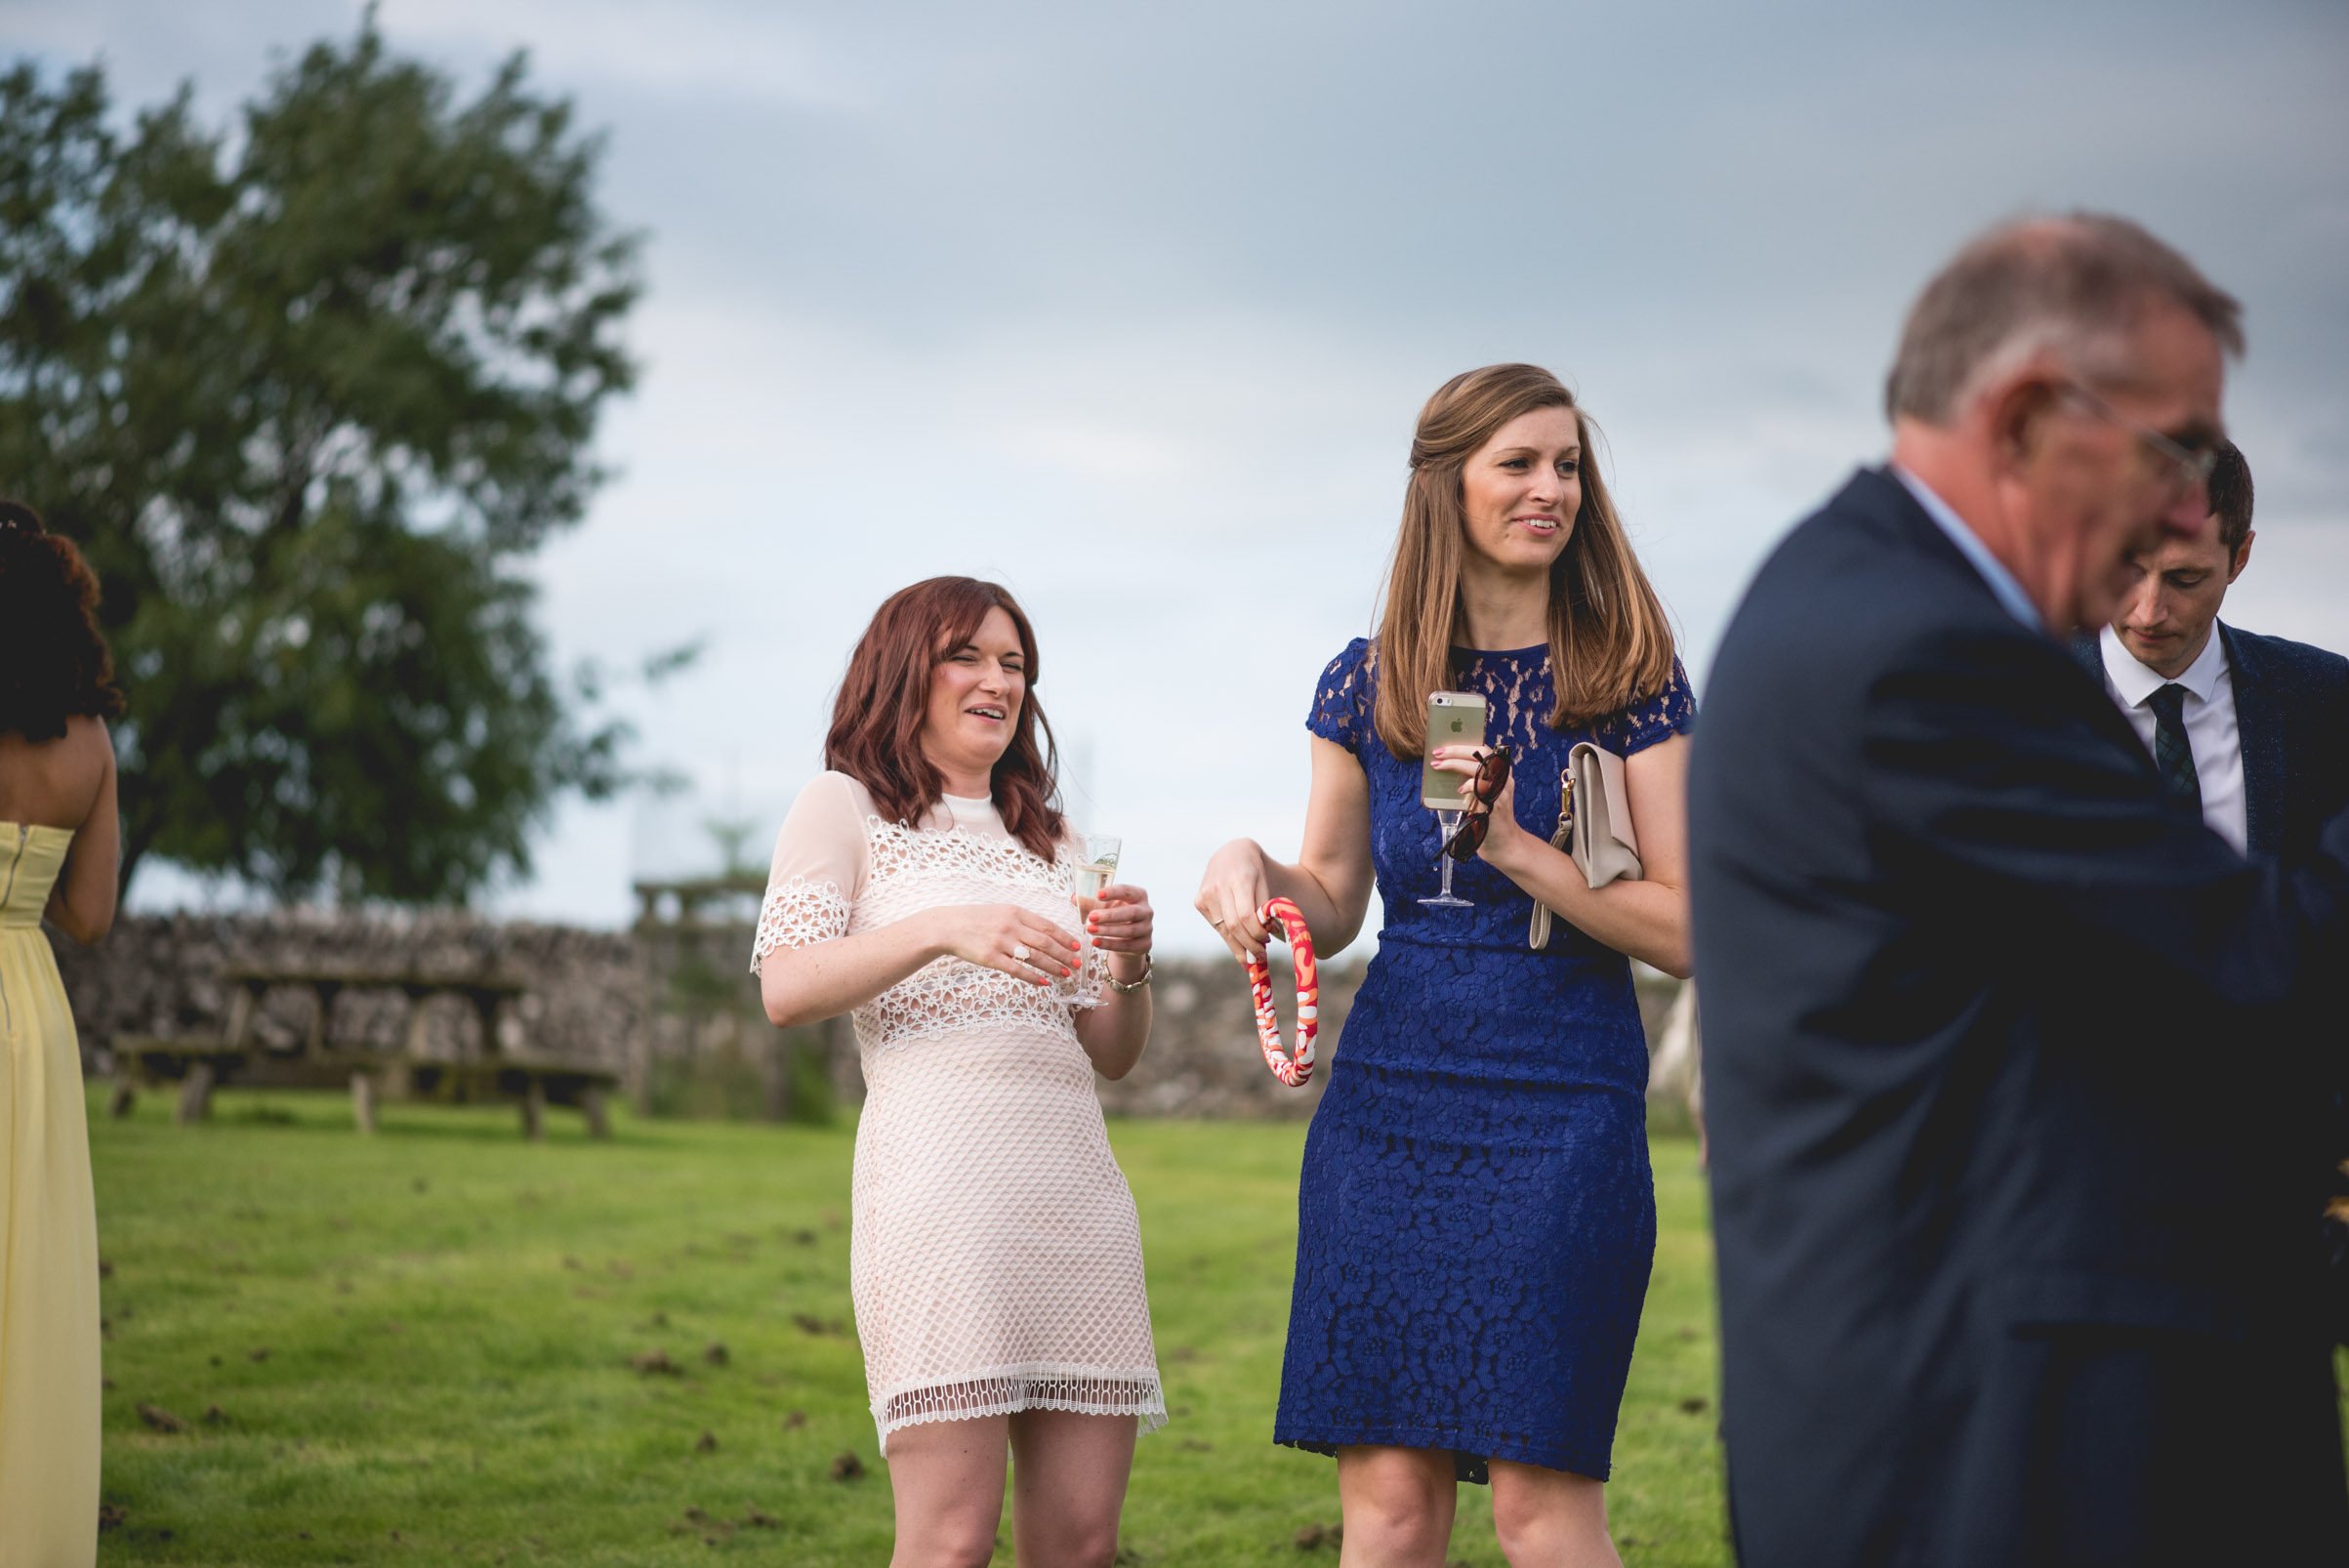 Peak+district+farm+wedding+lower+damgate+photographer-165.jpg